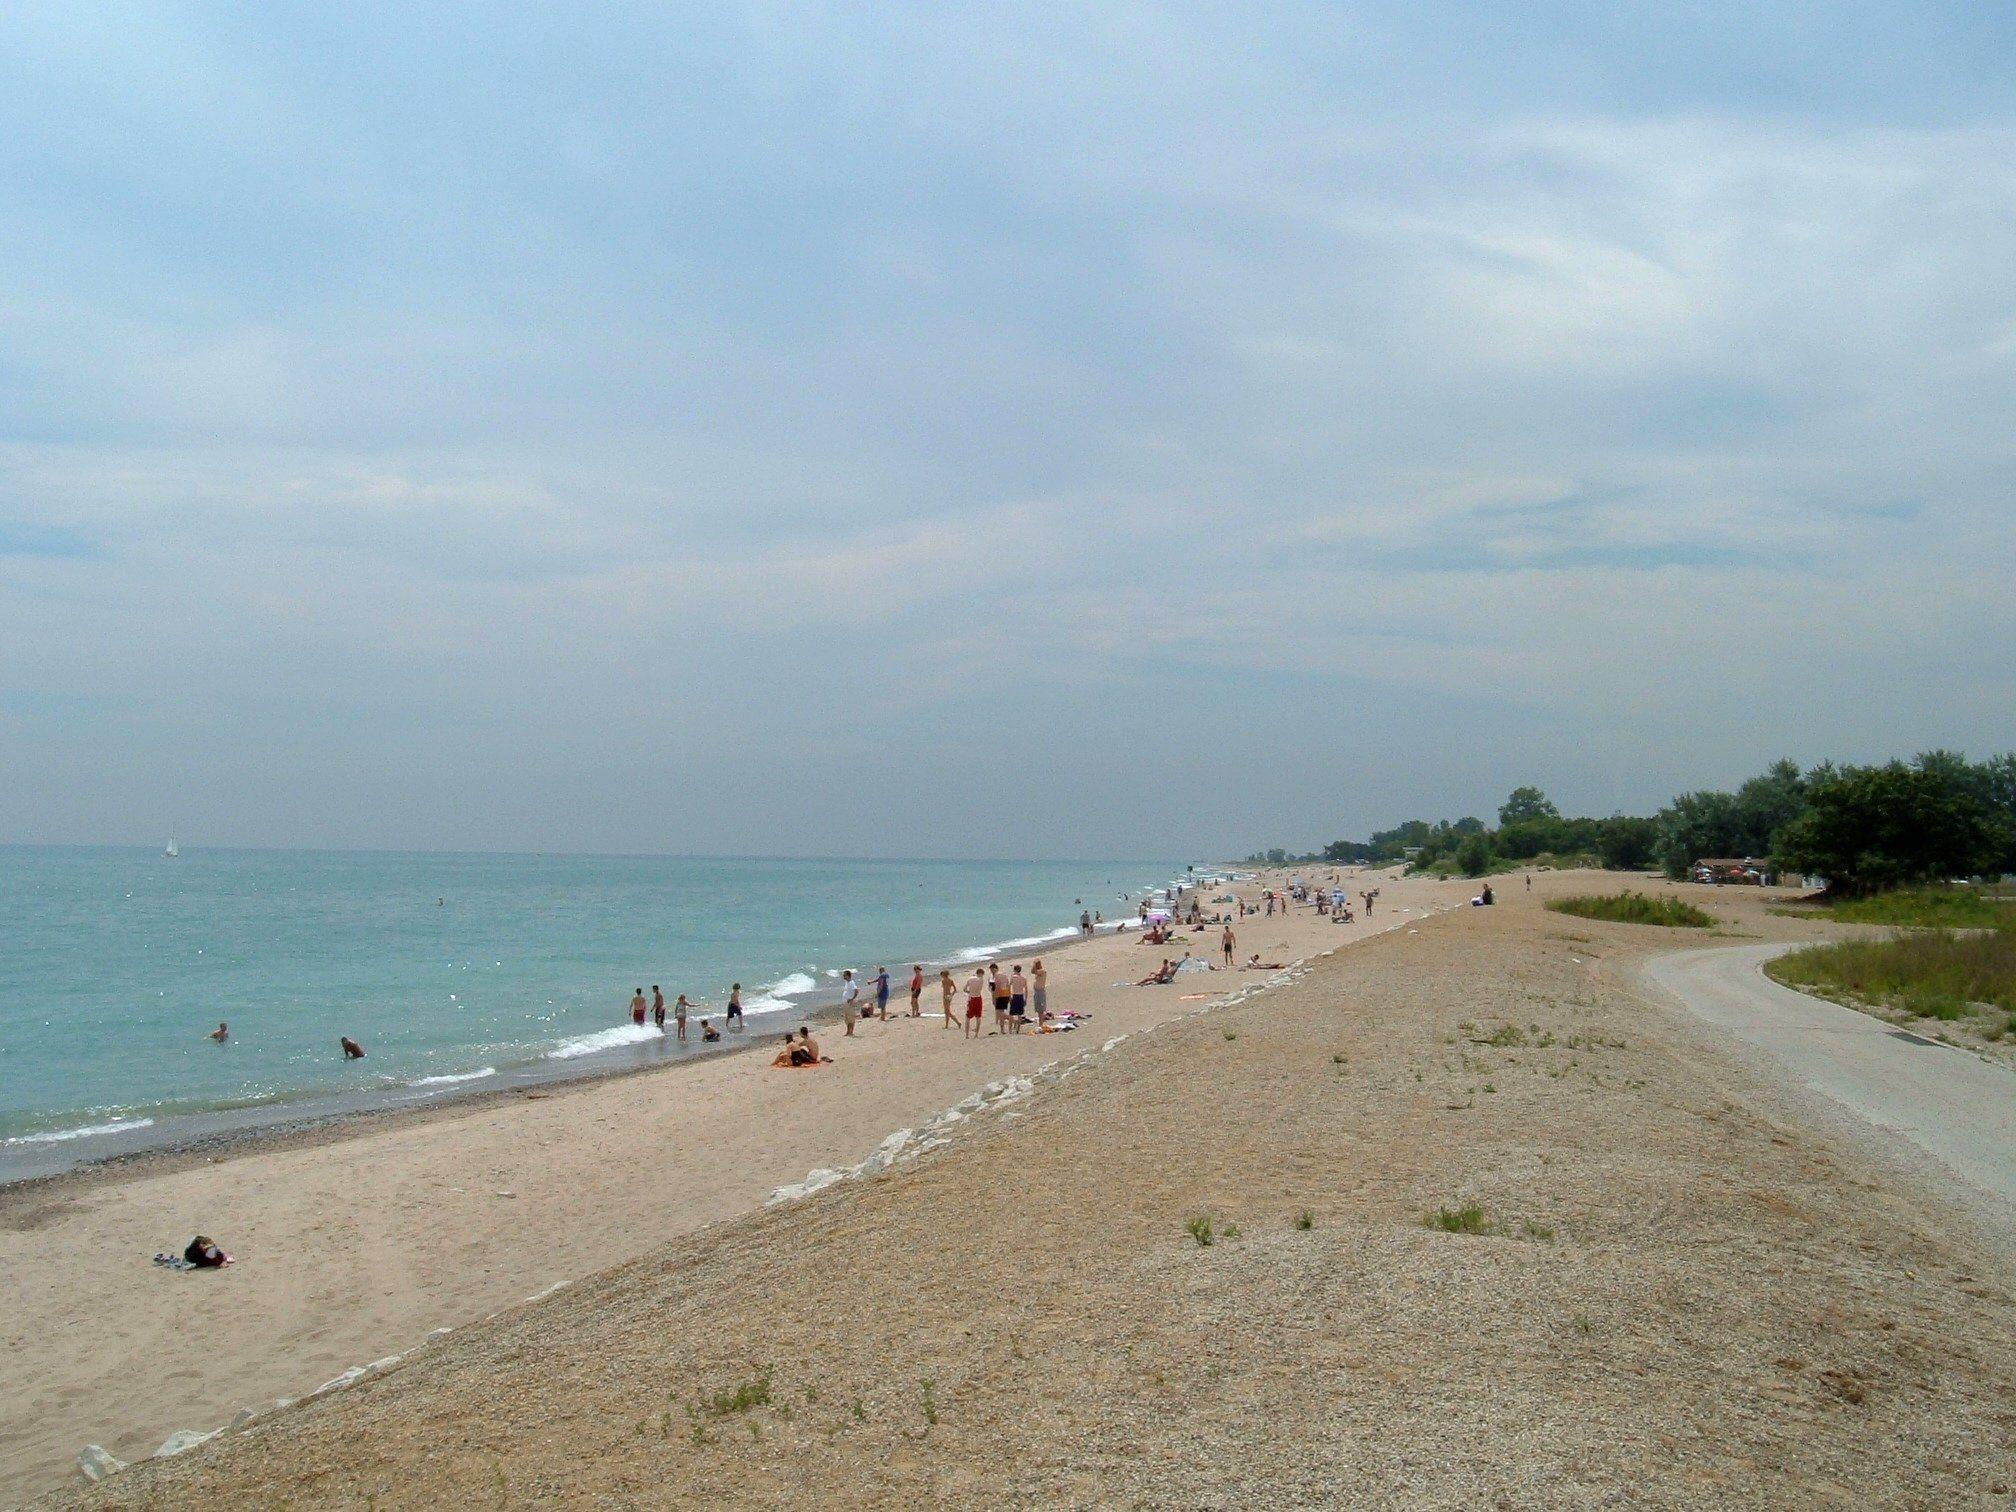 Illinois Beach State Park Zion Il Parks Chicago